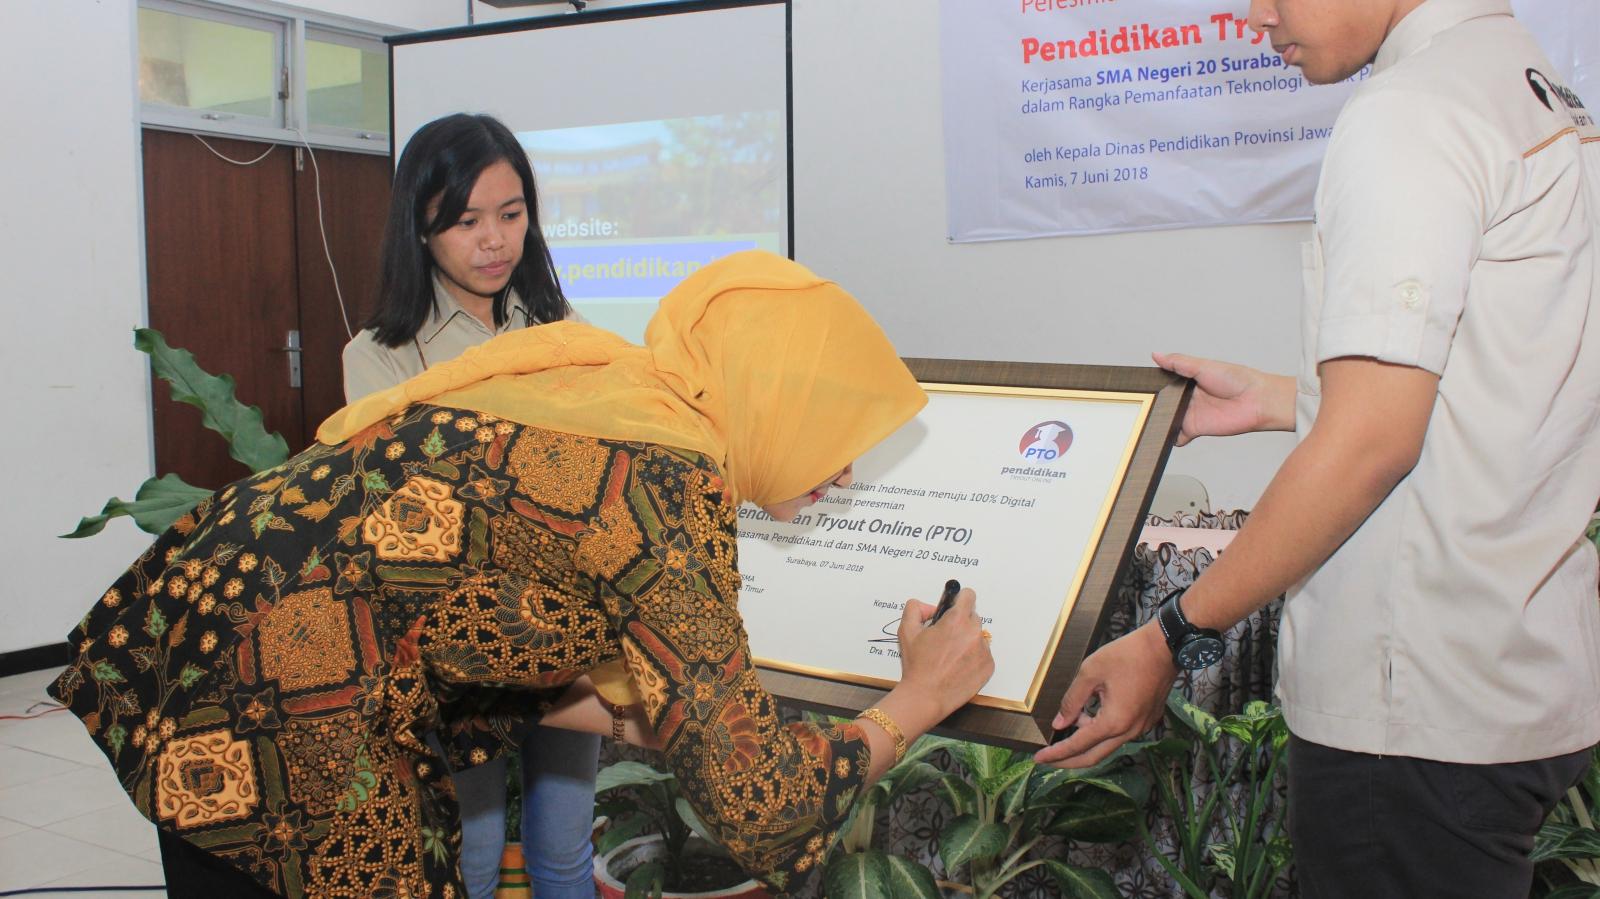 Peresmian Penggunaan Aplikasi PTO (Pendidikan Tryout Online) Bersama SMAN 20 Surabaya